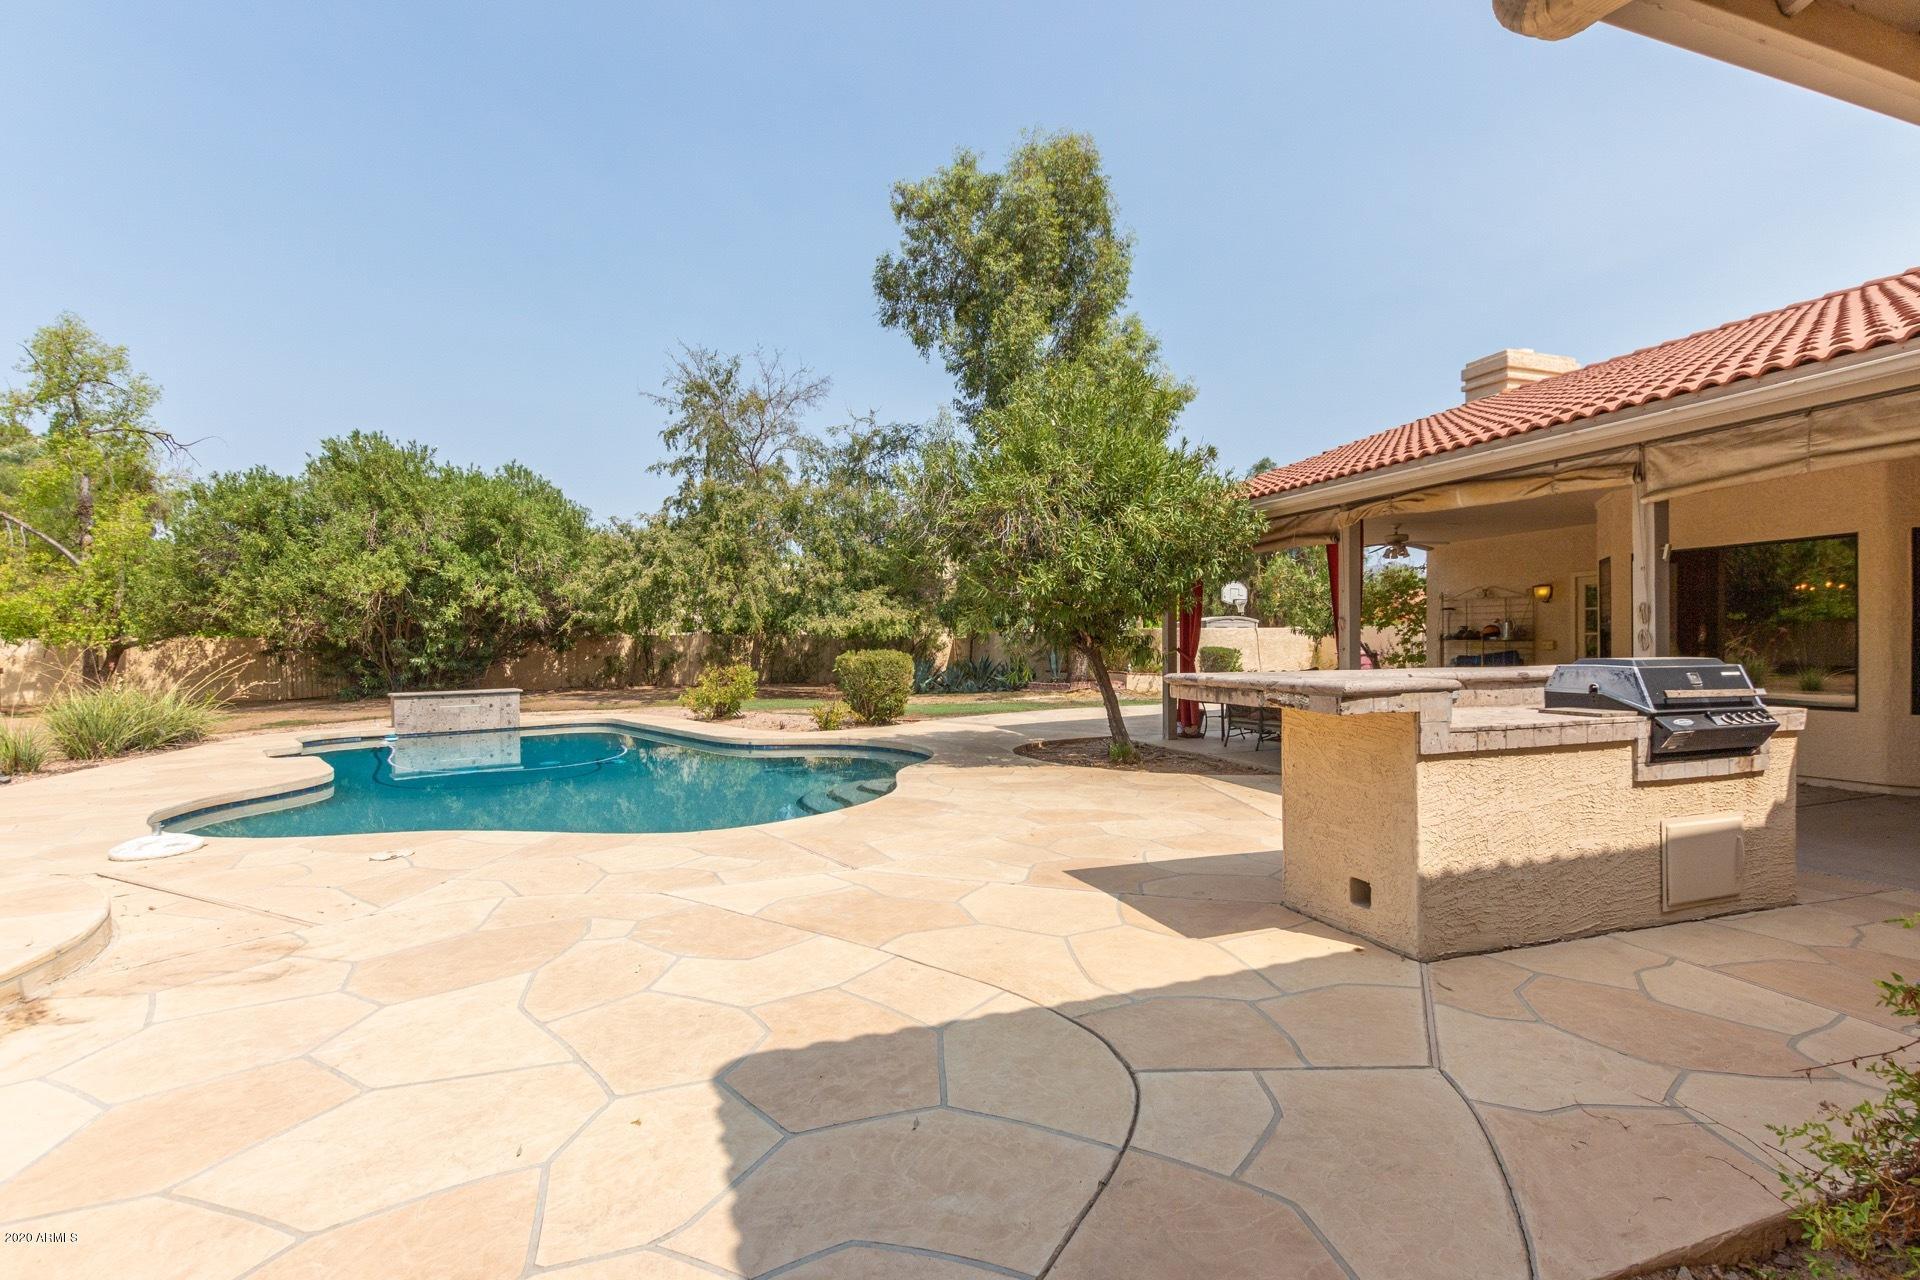 MLS 6133094 12470 N 86TH Street, Scottsdale, AZ 85260 Scottsdale AZ Private Pool